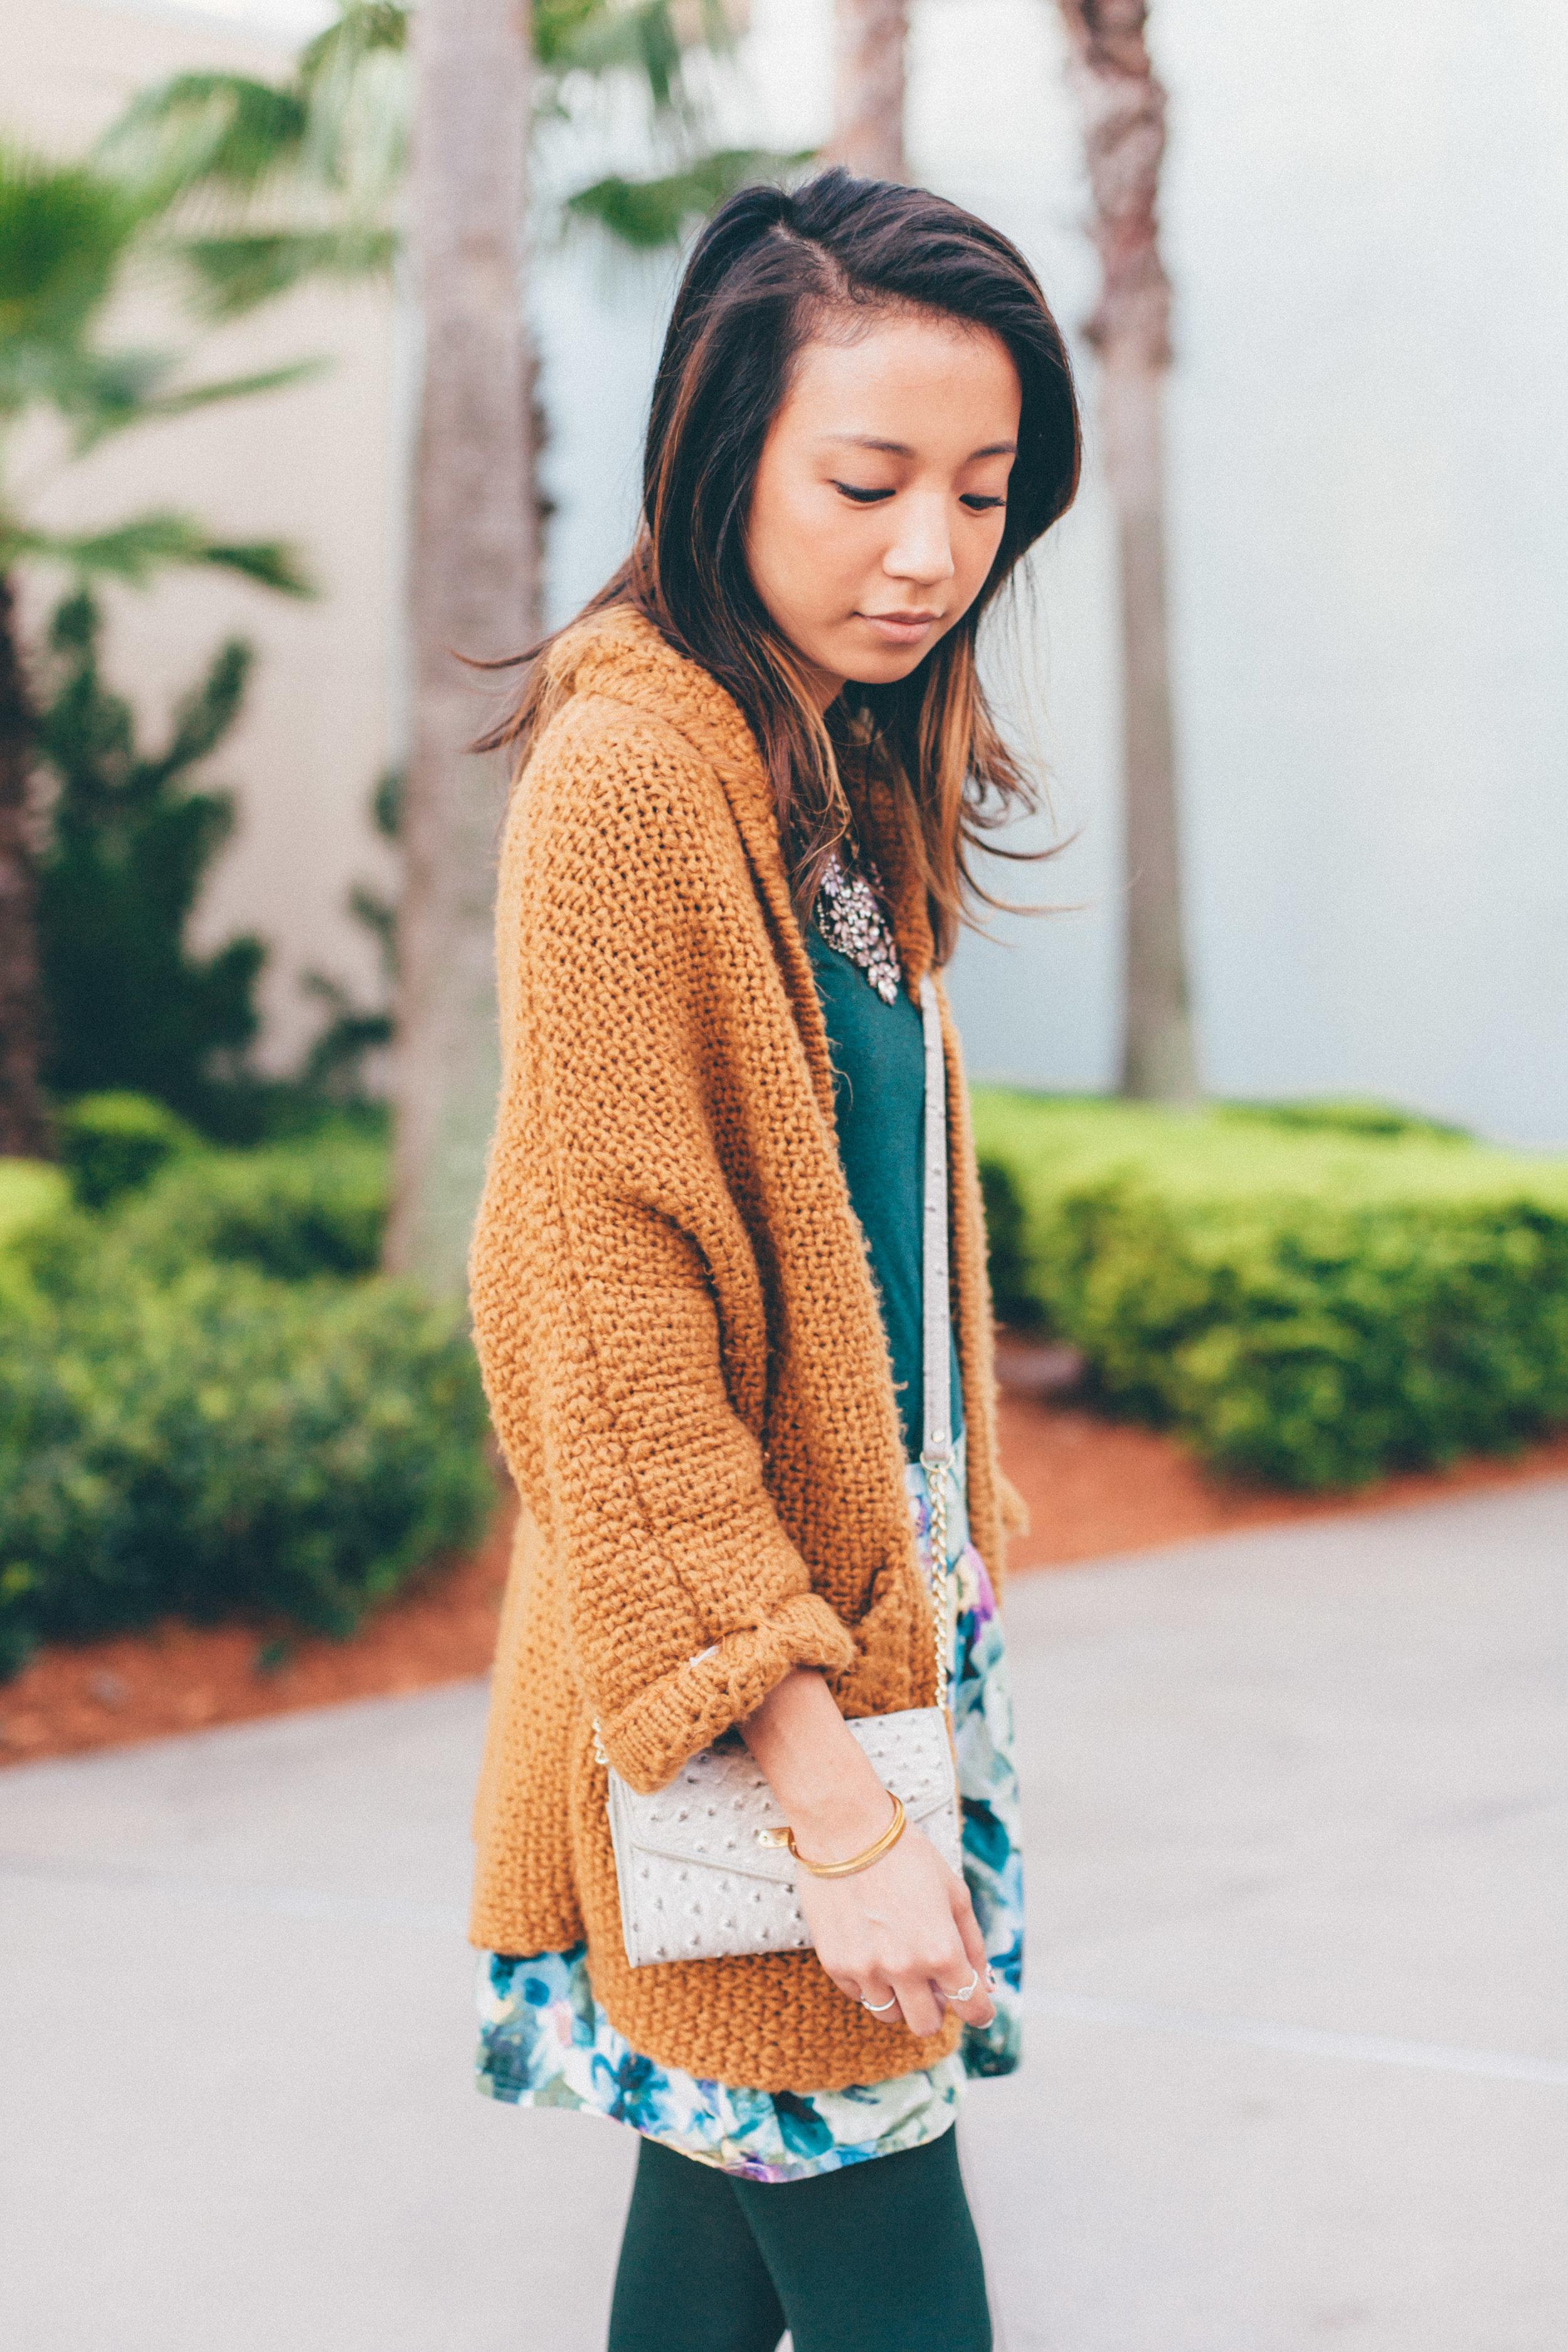 This Jenn Girl - Shein Sweater 4